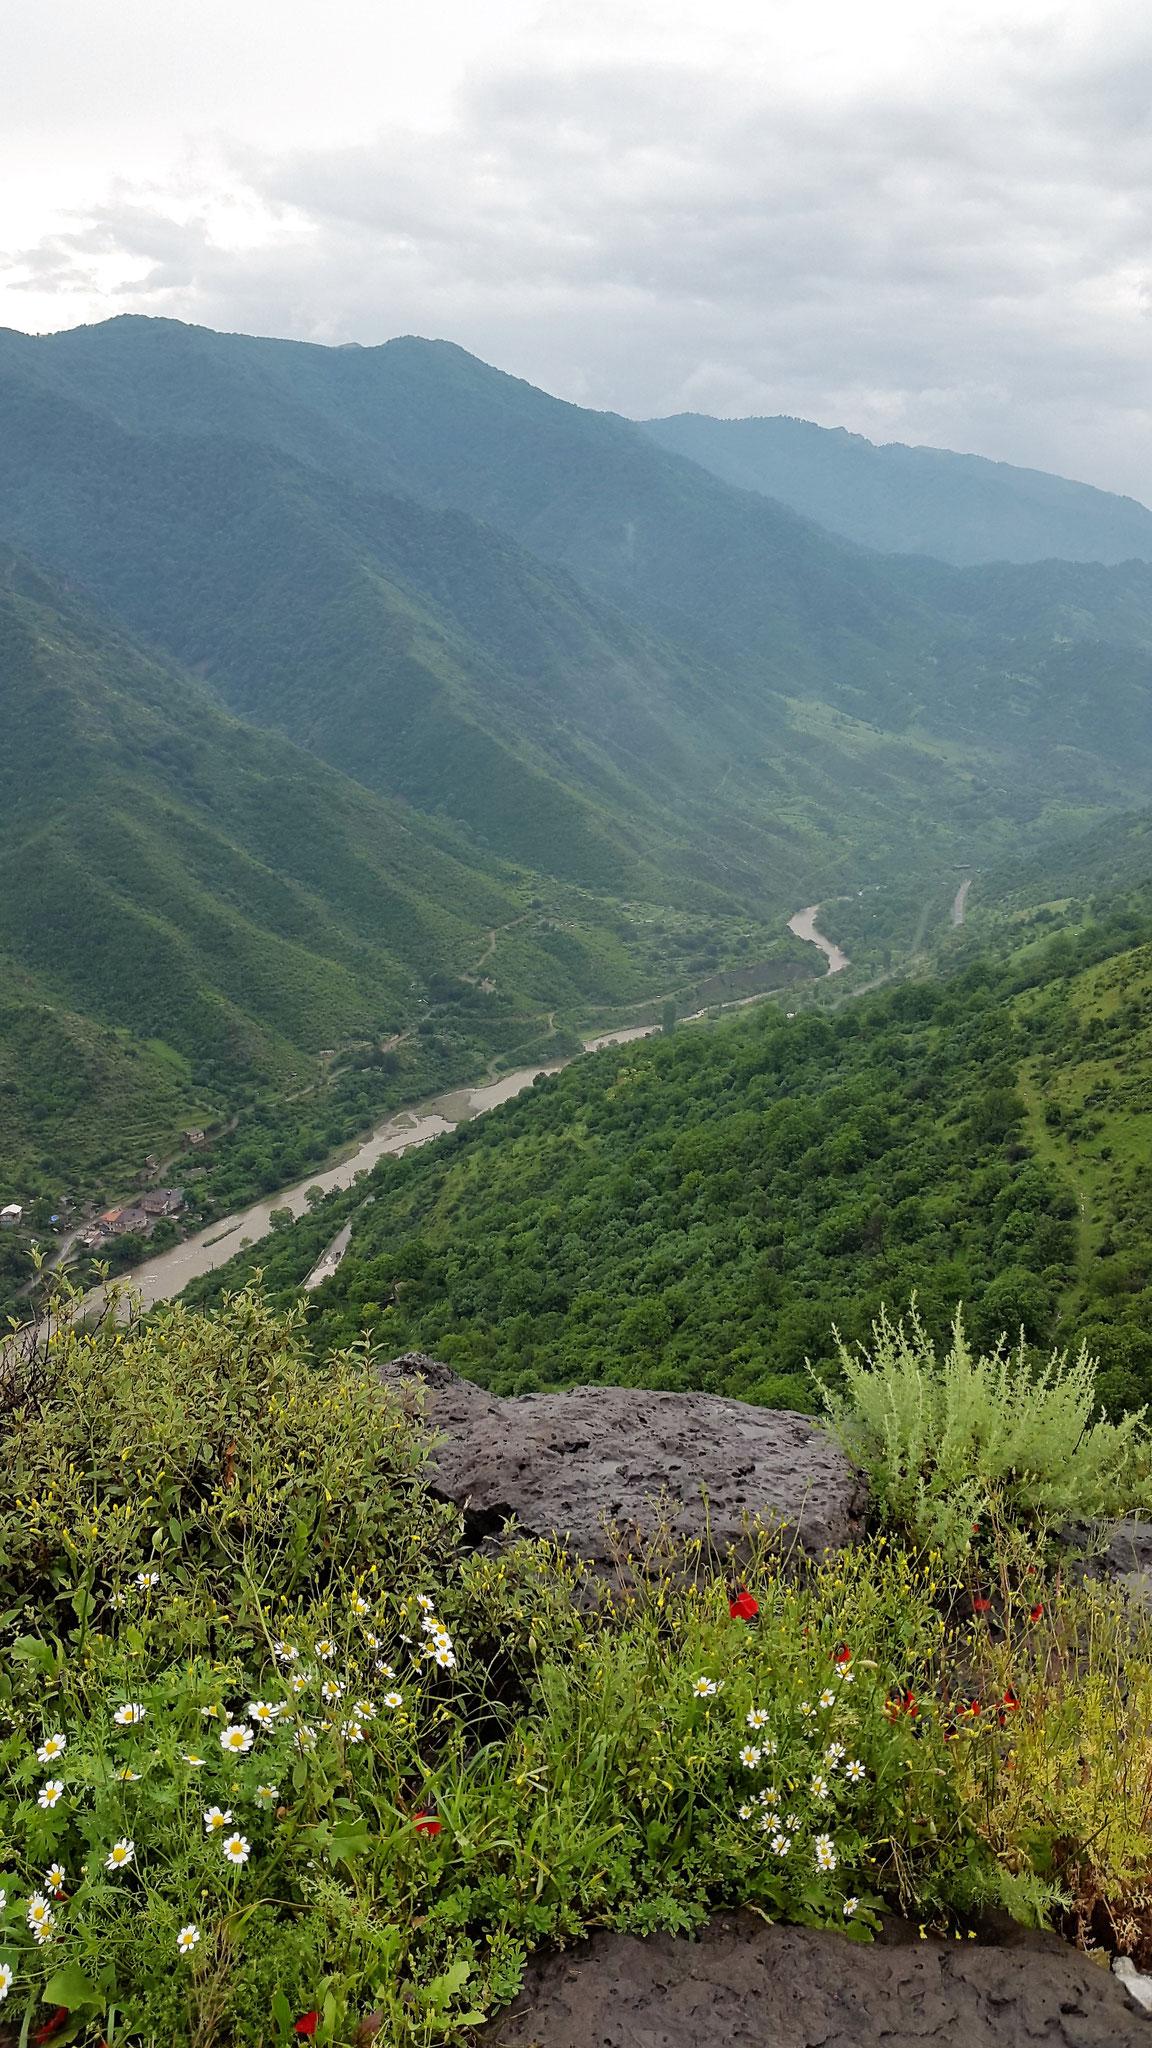 Blick ins Tal des Flusses Debed